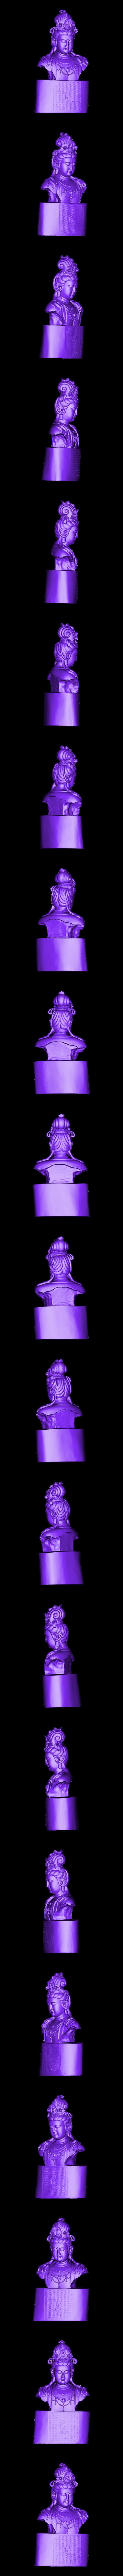 47guanyinz.stl Download free OBJ file guanyin bodhisattva kwan-yin sculpture for cnc or 3d printer 47 • 3D printer template, stlfilesfree